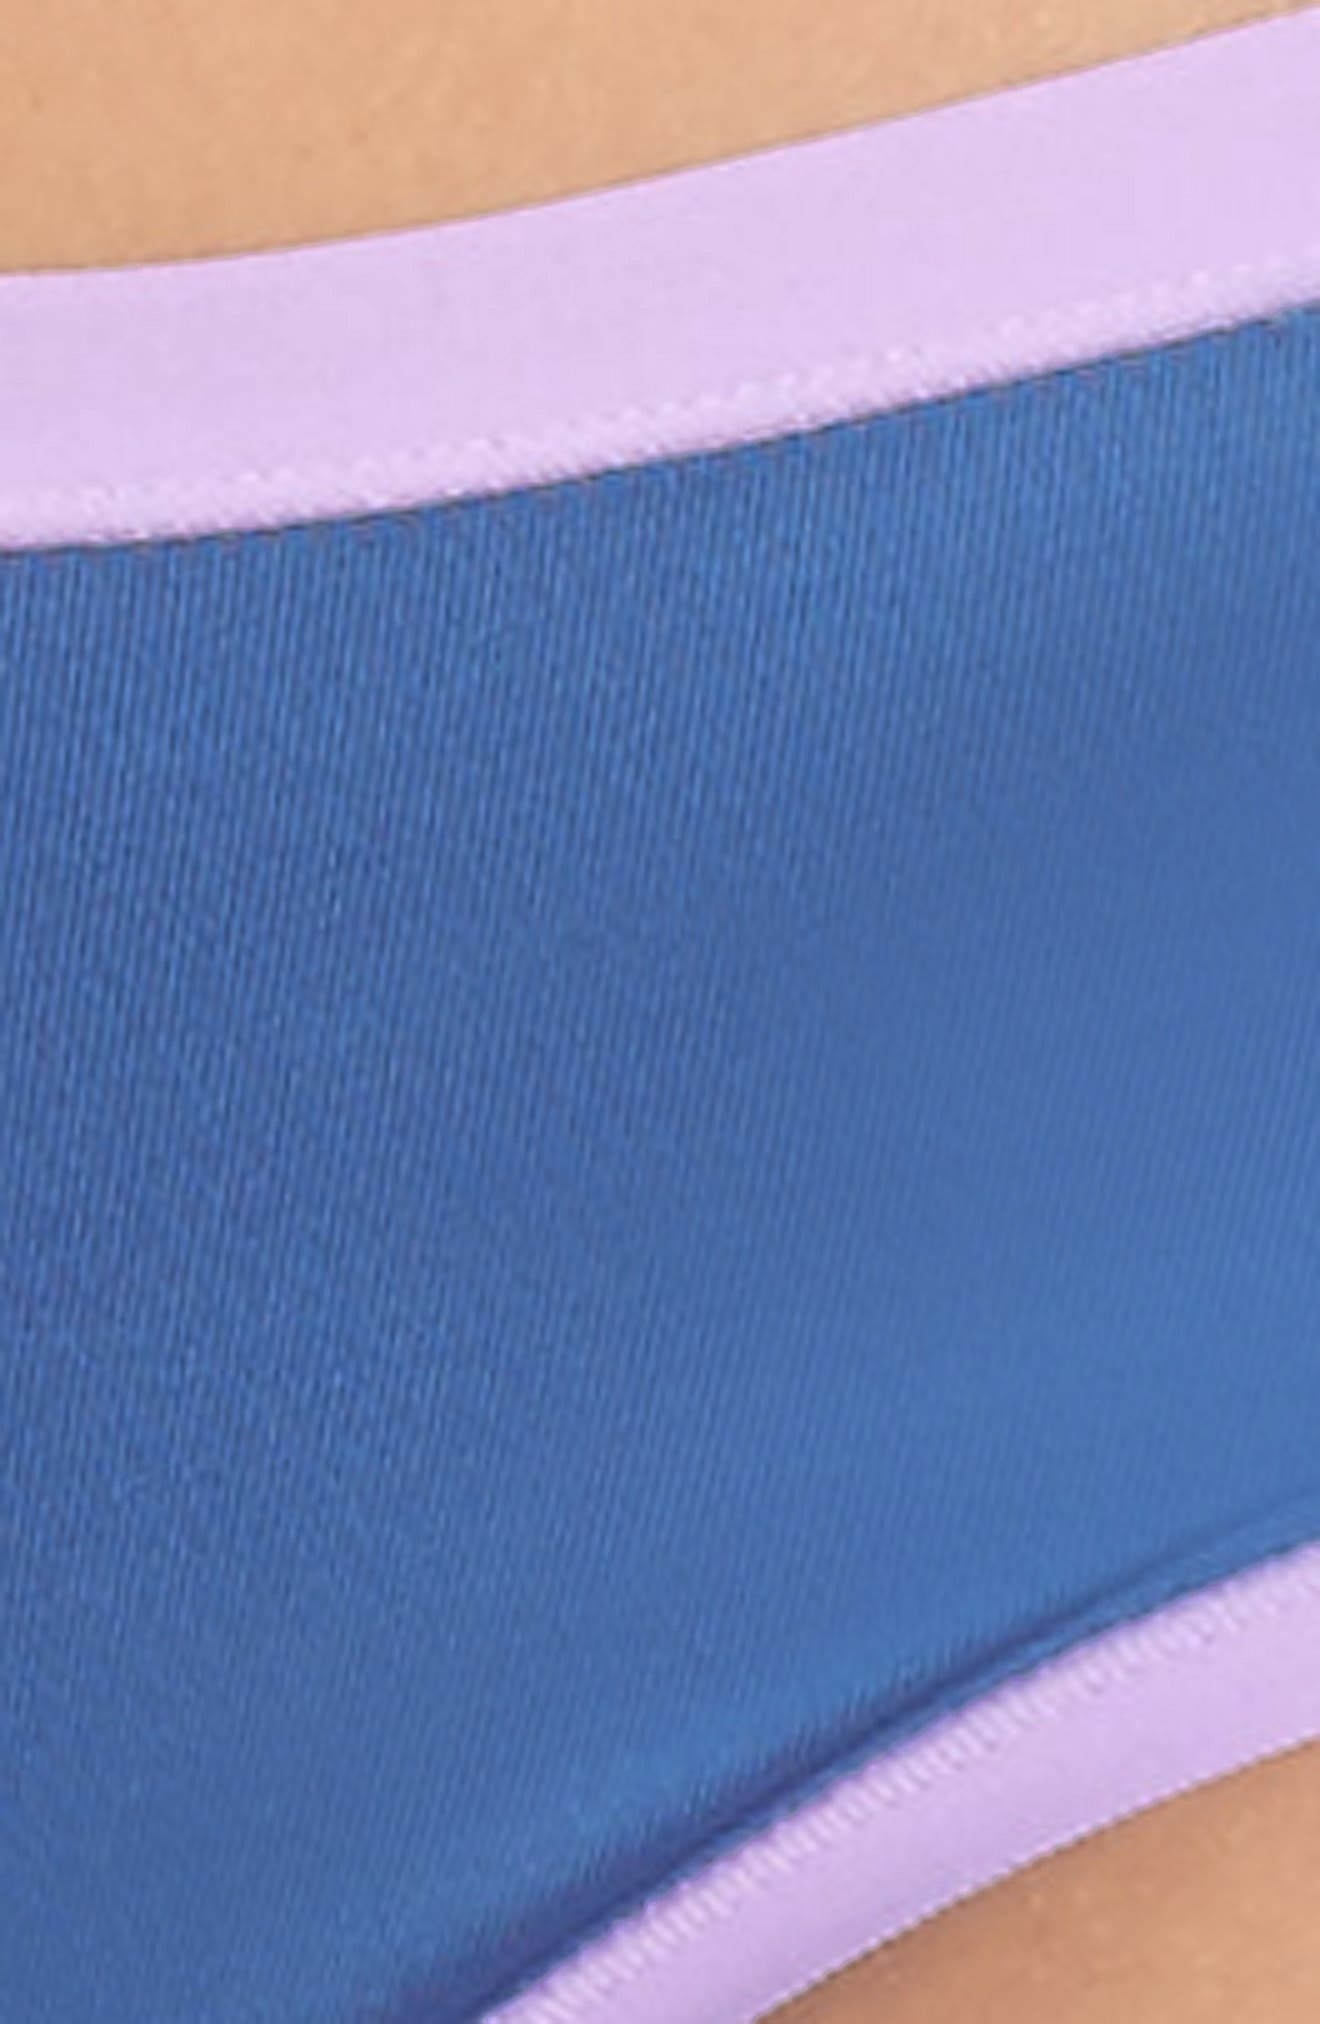 Yogi Girl Briefs,                             Alternate thumbnail 4, color,                             400